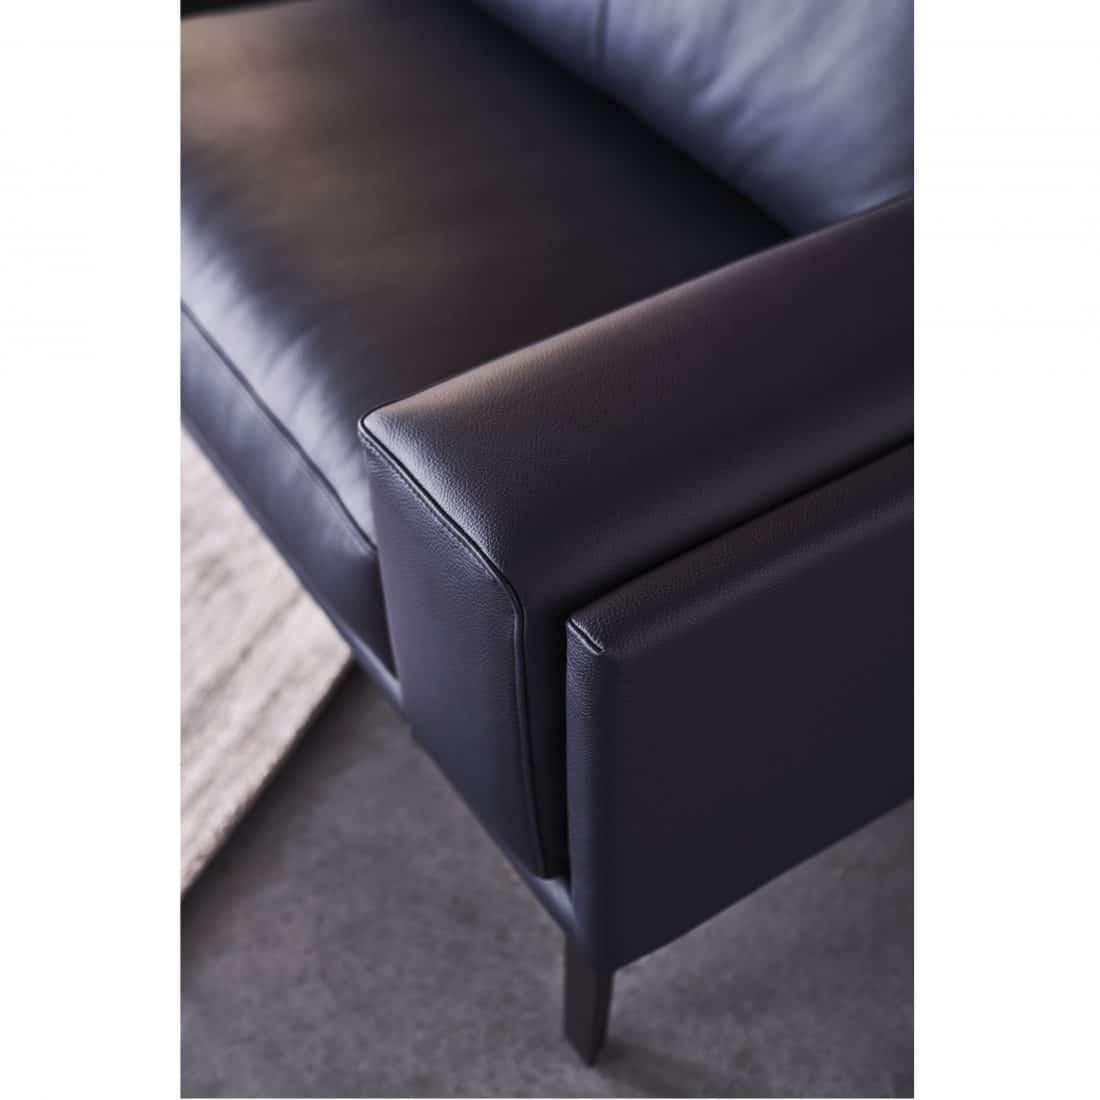 Leolux Bellice Leather Black 0016 2 Scaled